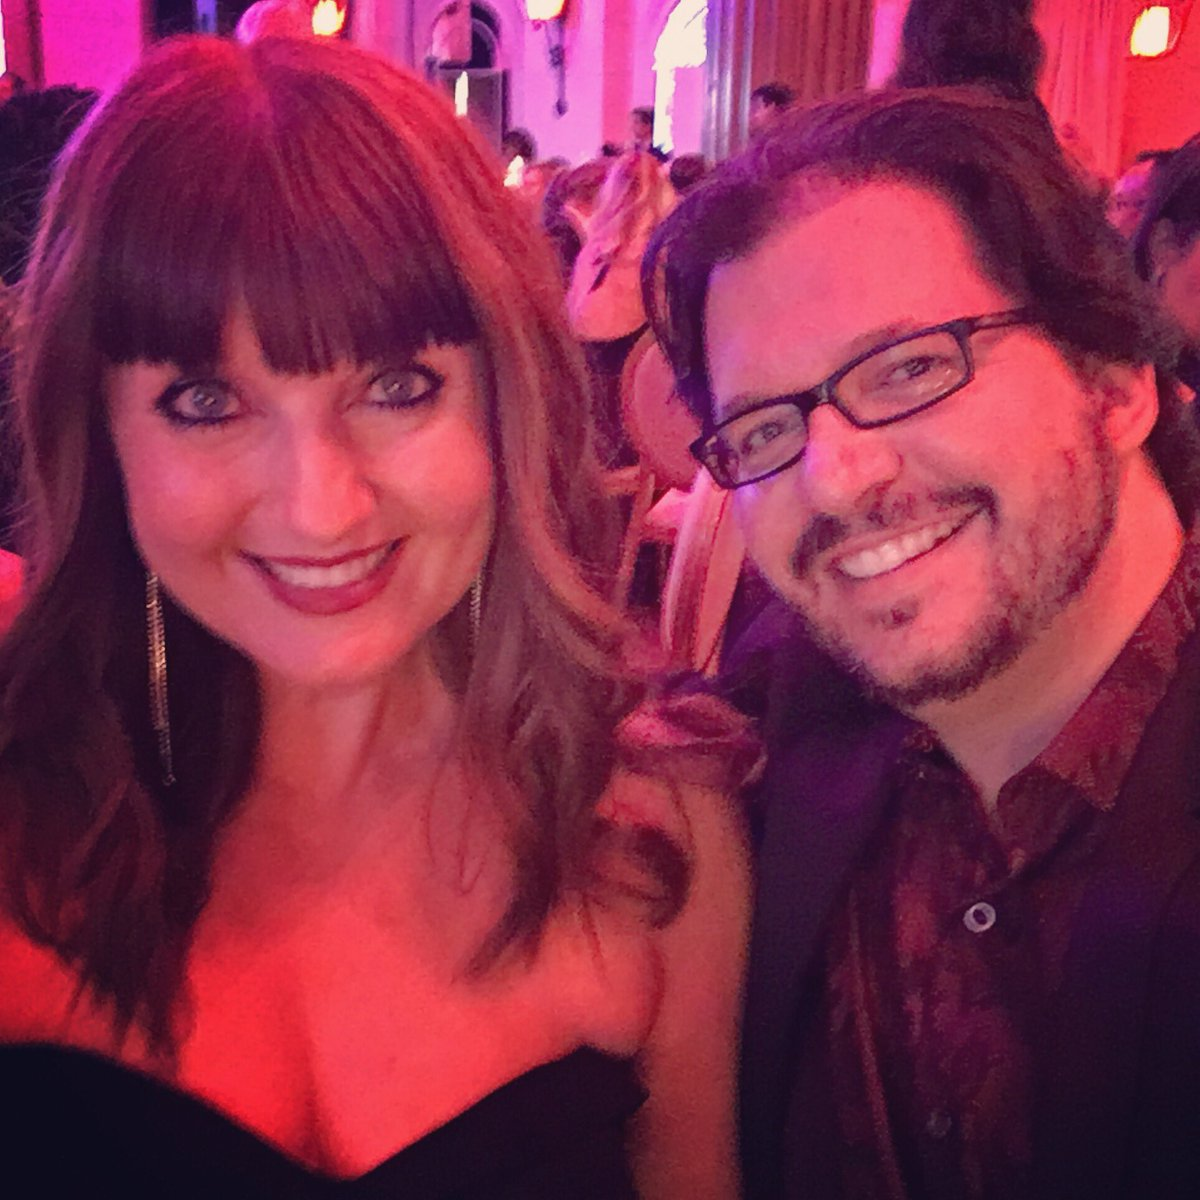 Scott Pietrangelo On Twitter Date Night With My Lady For A Great Cause Apjtiff2019 Tiff Tiff2019 Tiff Net Alisoneastwood